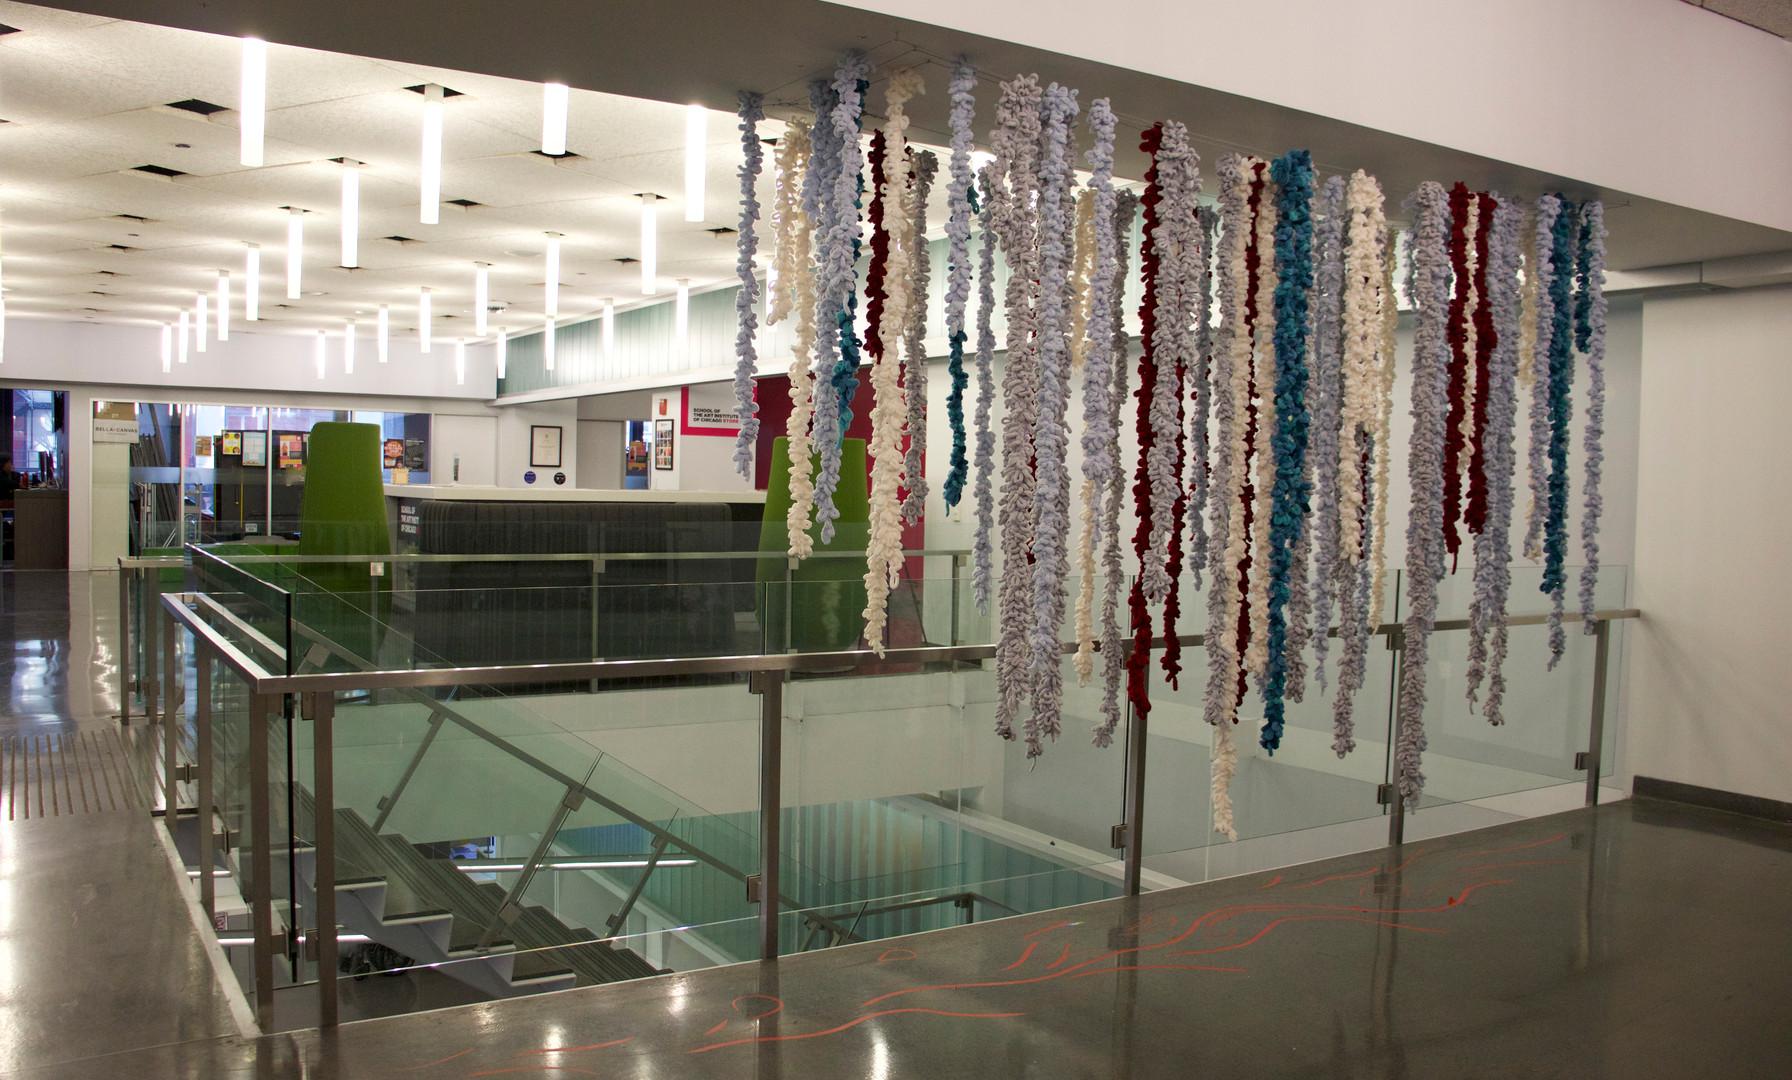 Installtion location: LeRoy Neiman Center 2nd floor, Chicago IL